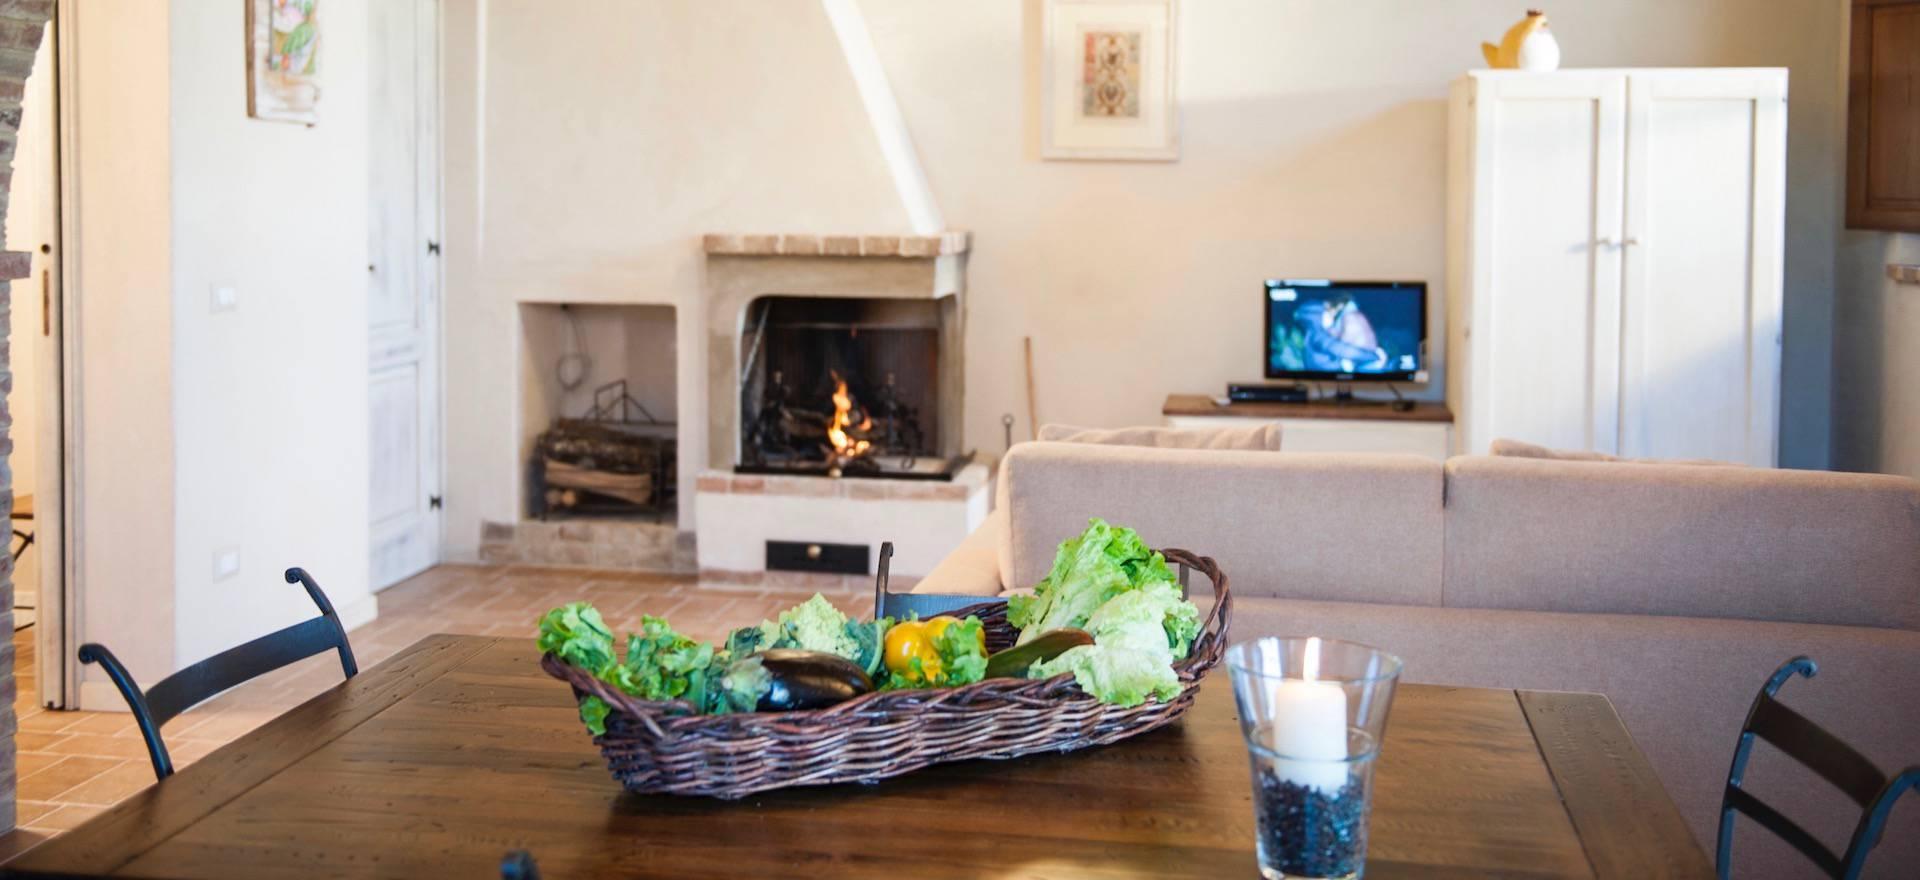 Agriturismo Toscana Agriturismo vicino Siena: pace, natura, lusso e comfort